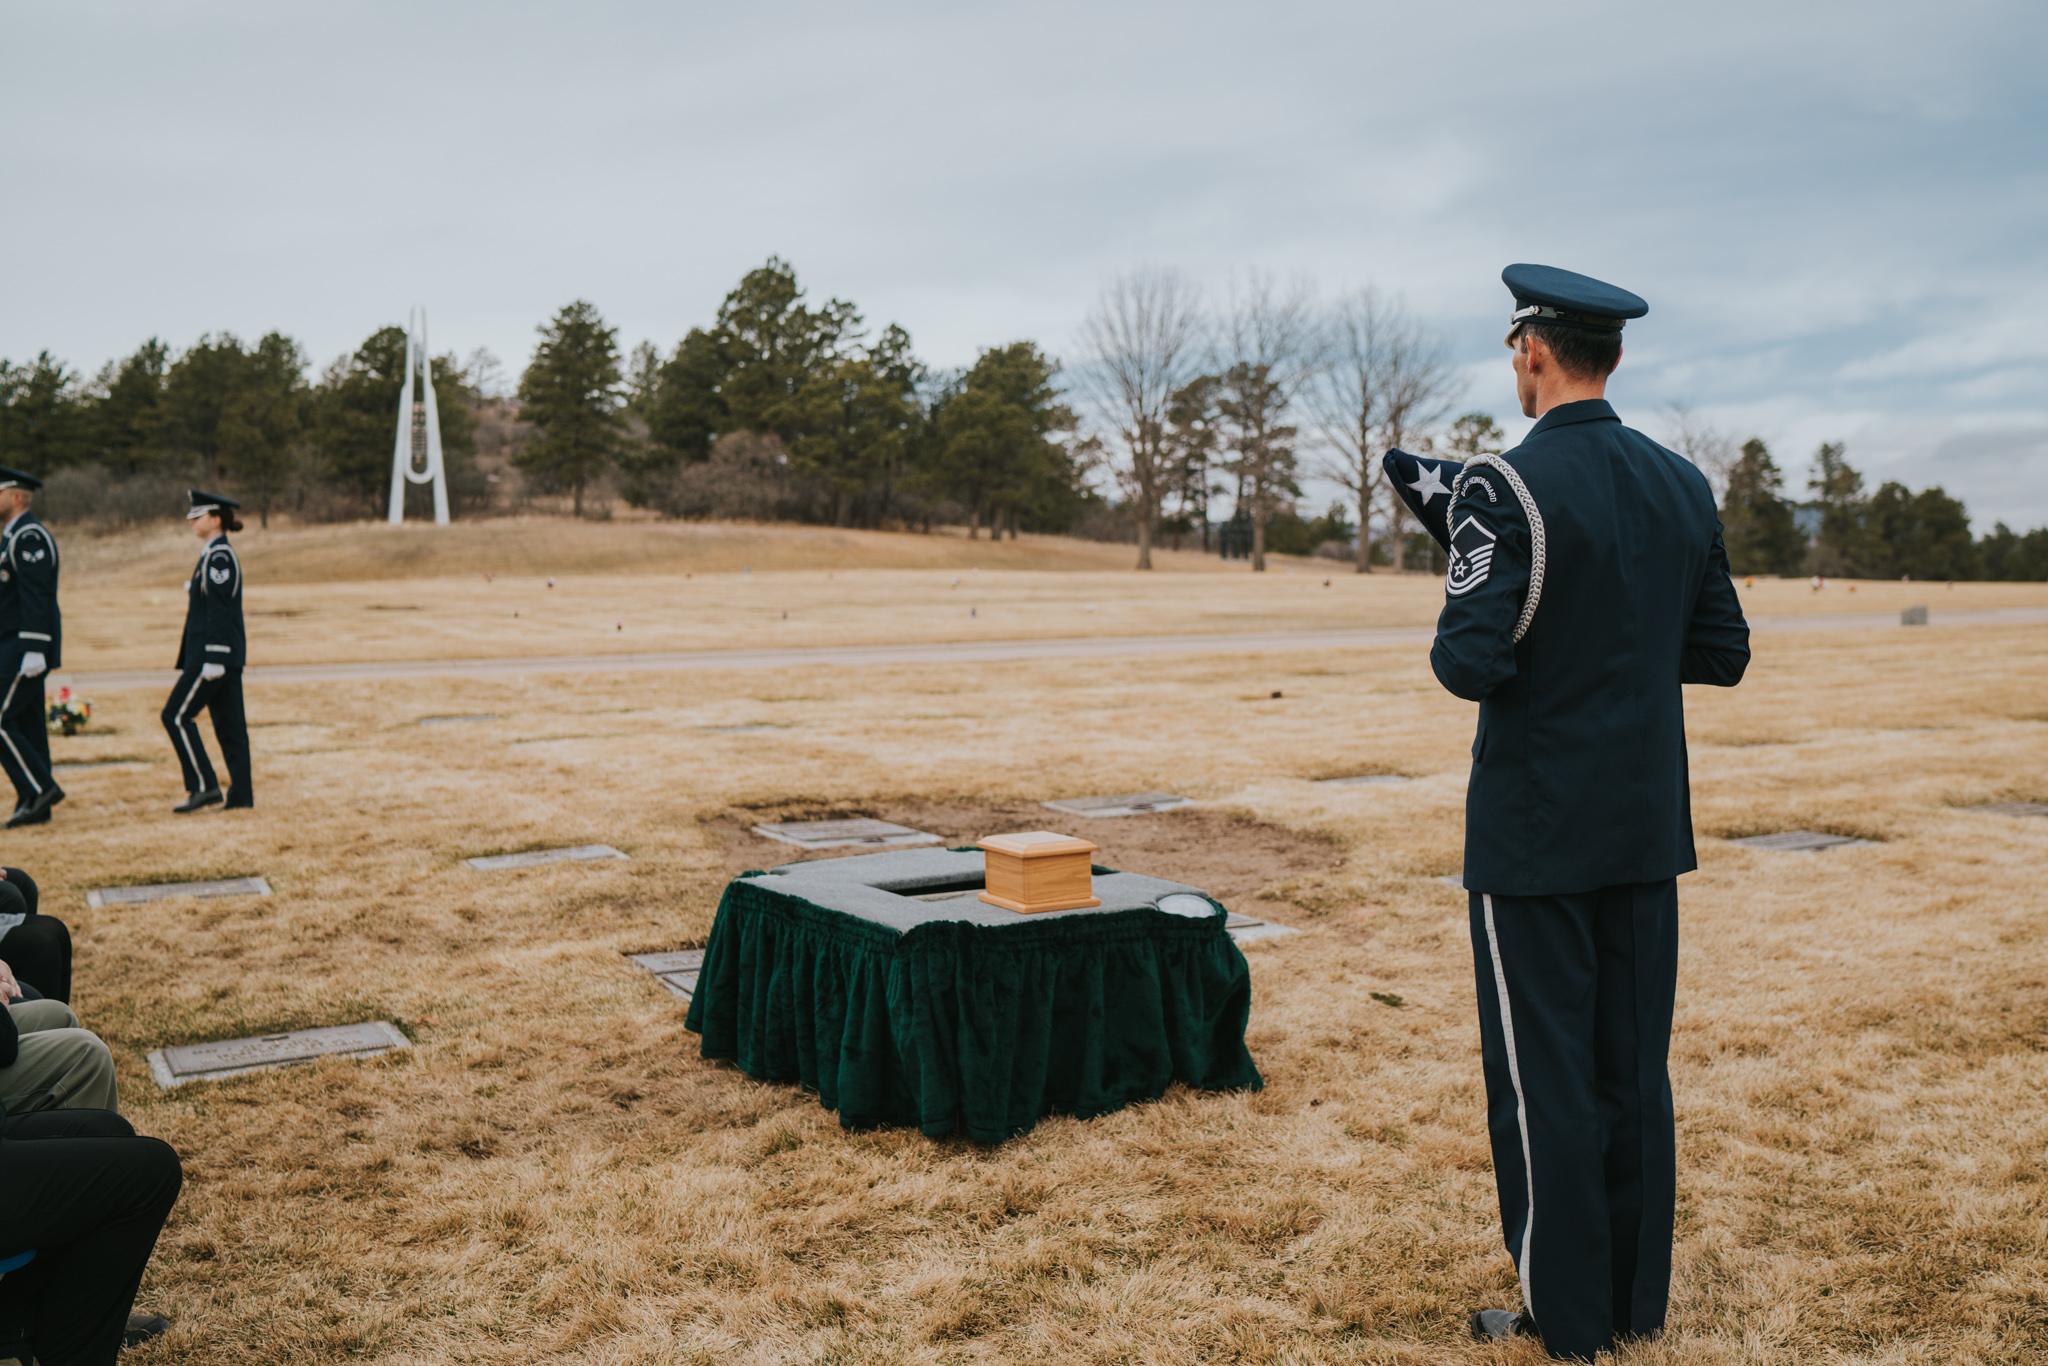 usafa-colorado-military-honours-burial-funeral-photography-grace-elizabeth-colchester-essex-alternative-wedding-lifestyle-photographer (62 of 127).jpg